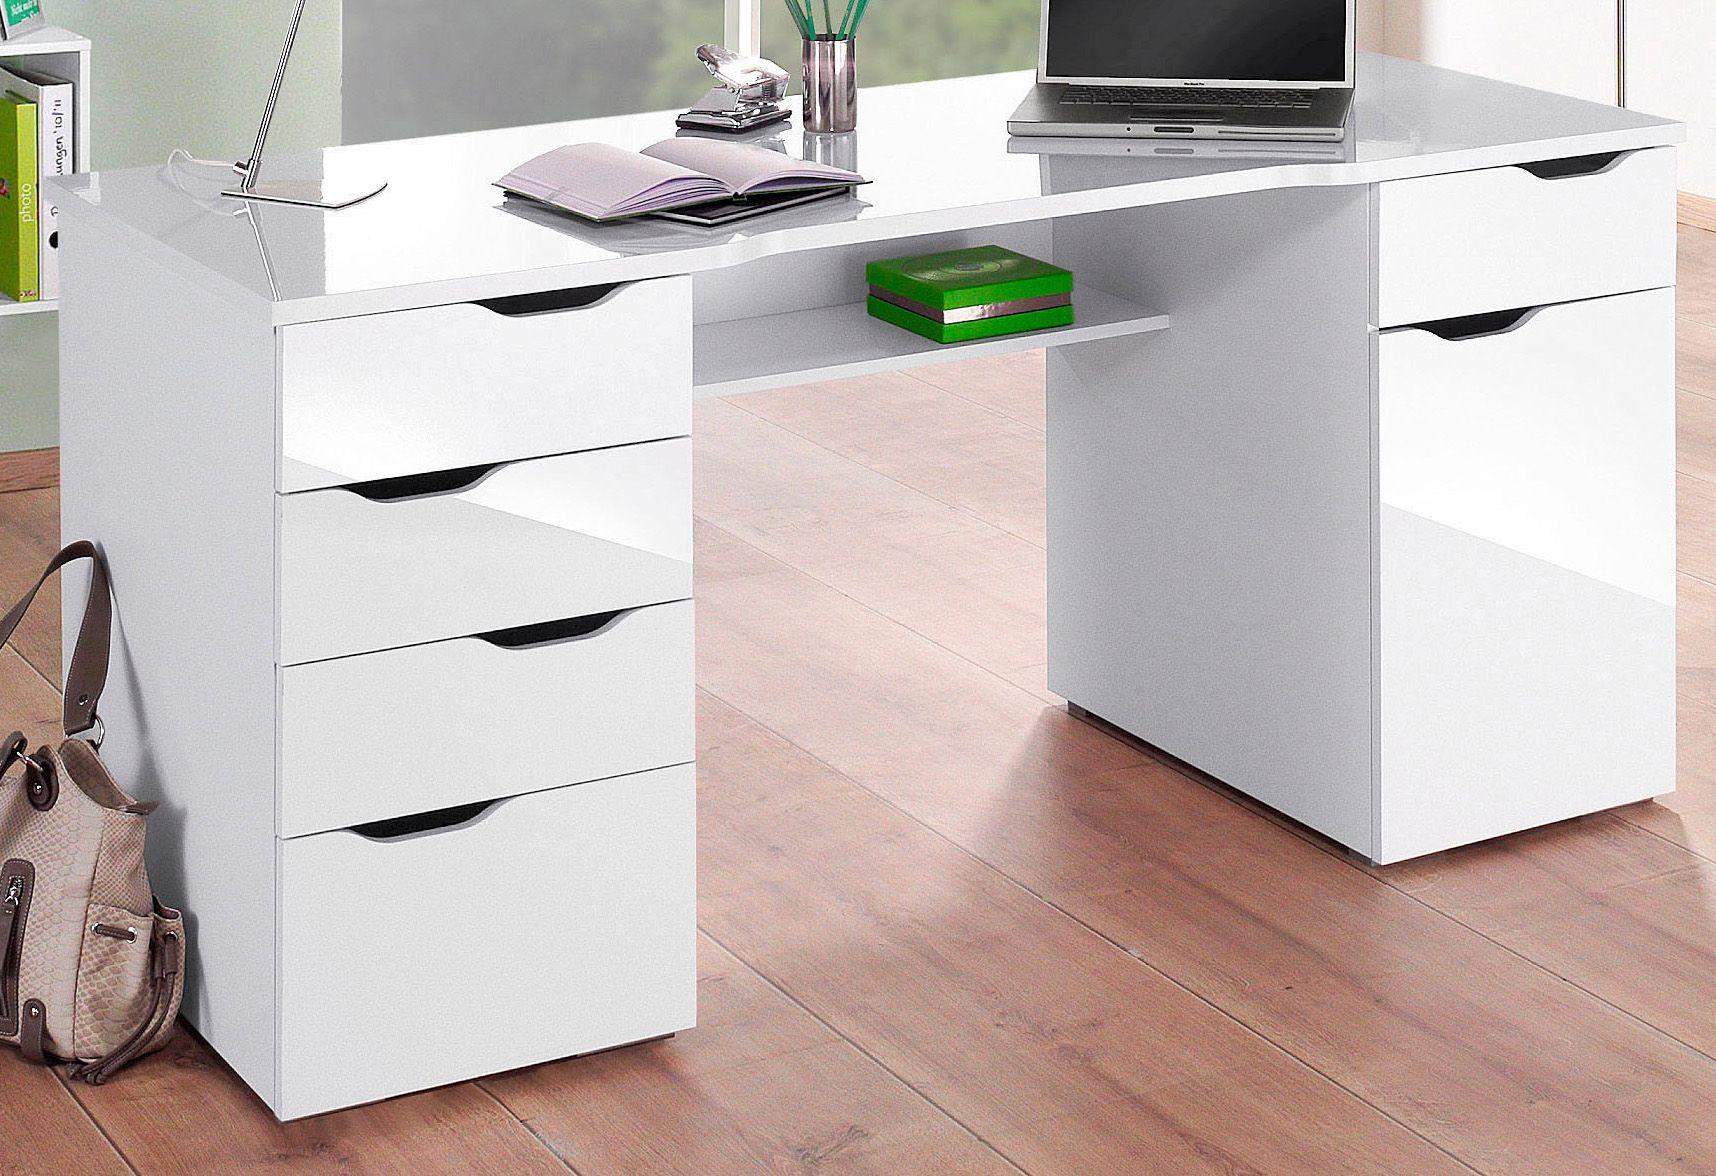 schreibtisch maja m bel cuba schwab versand schreibtische. Black Bedroom Furniture Sets. Home Design Ideas